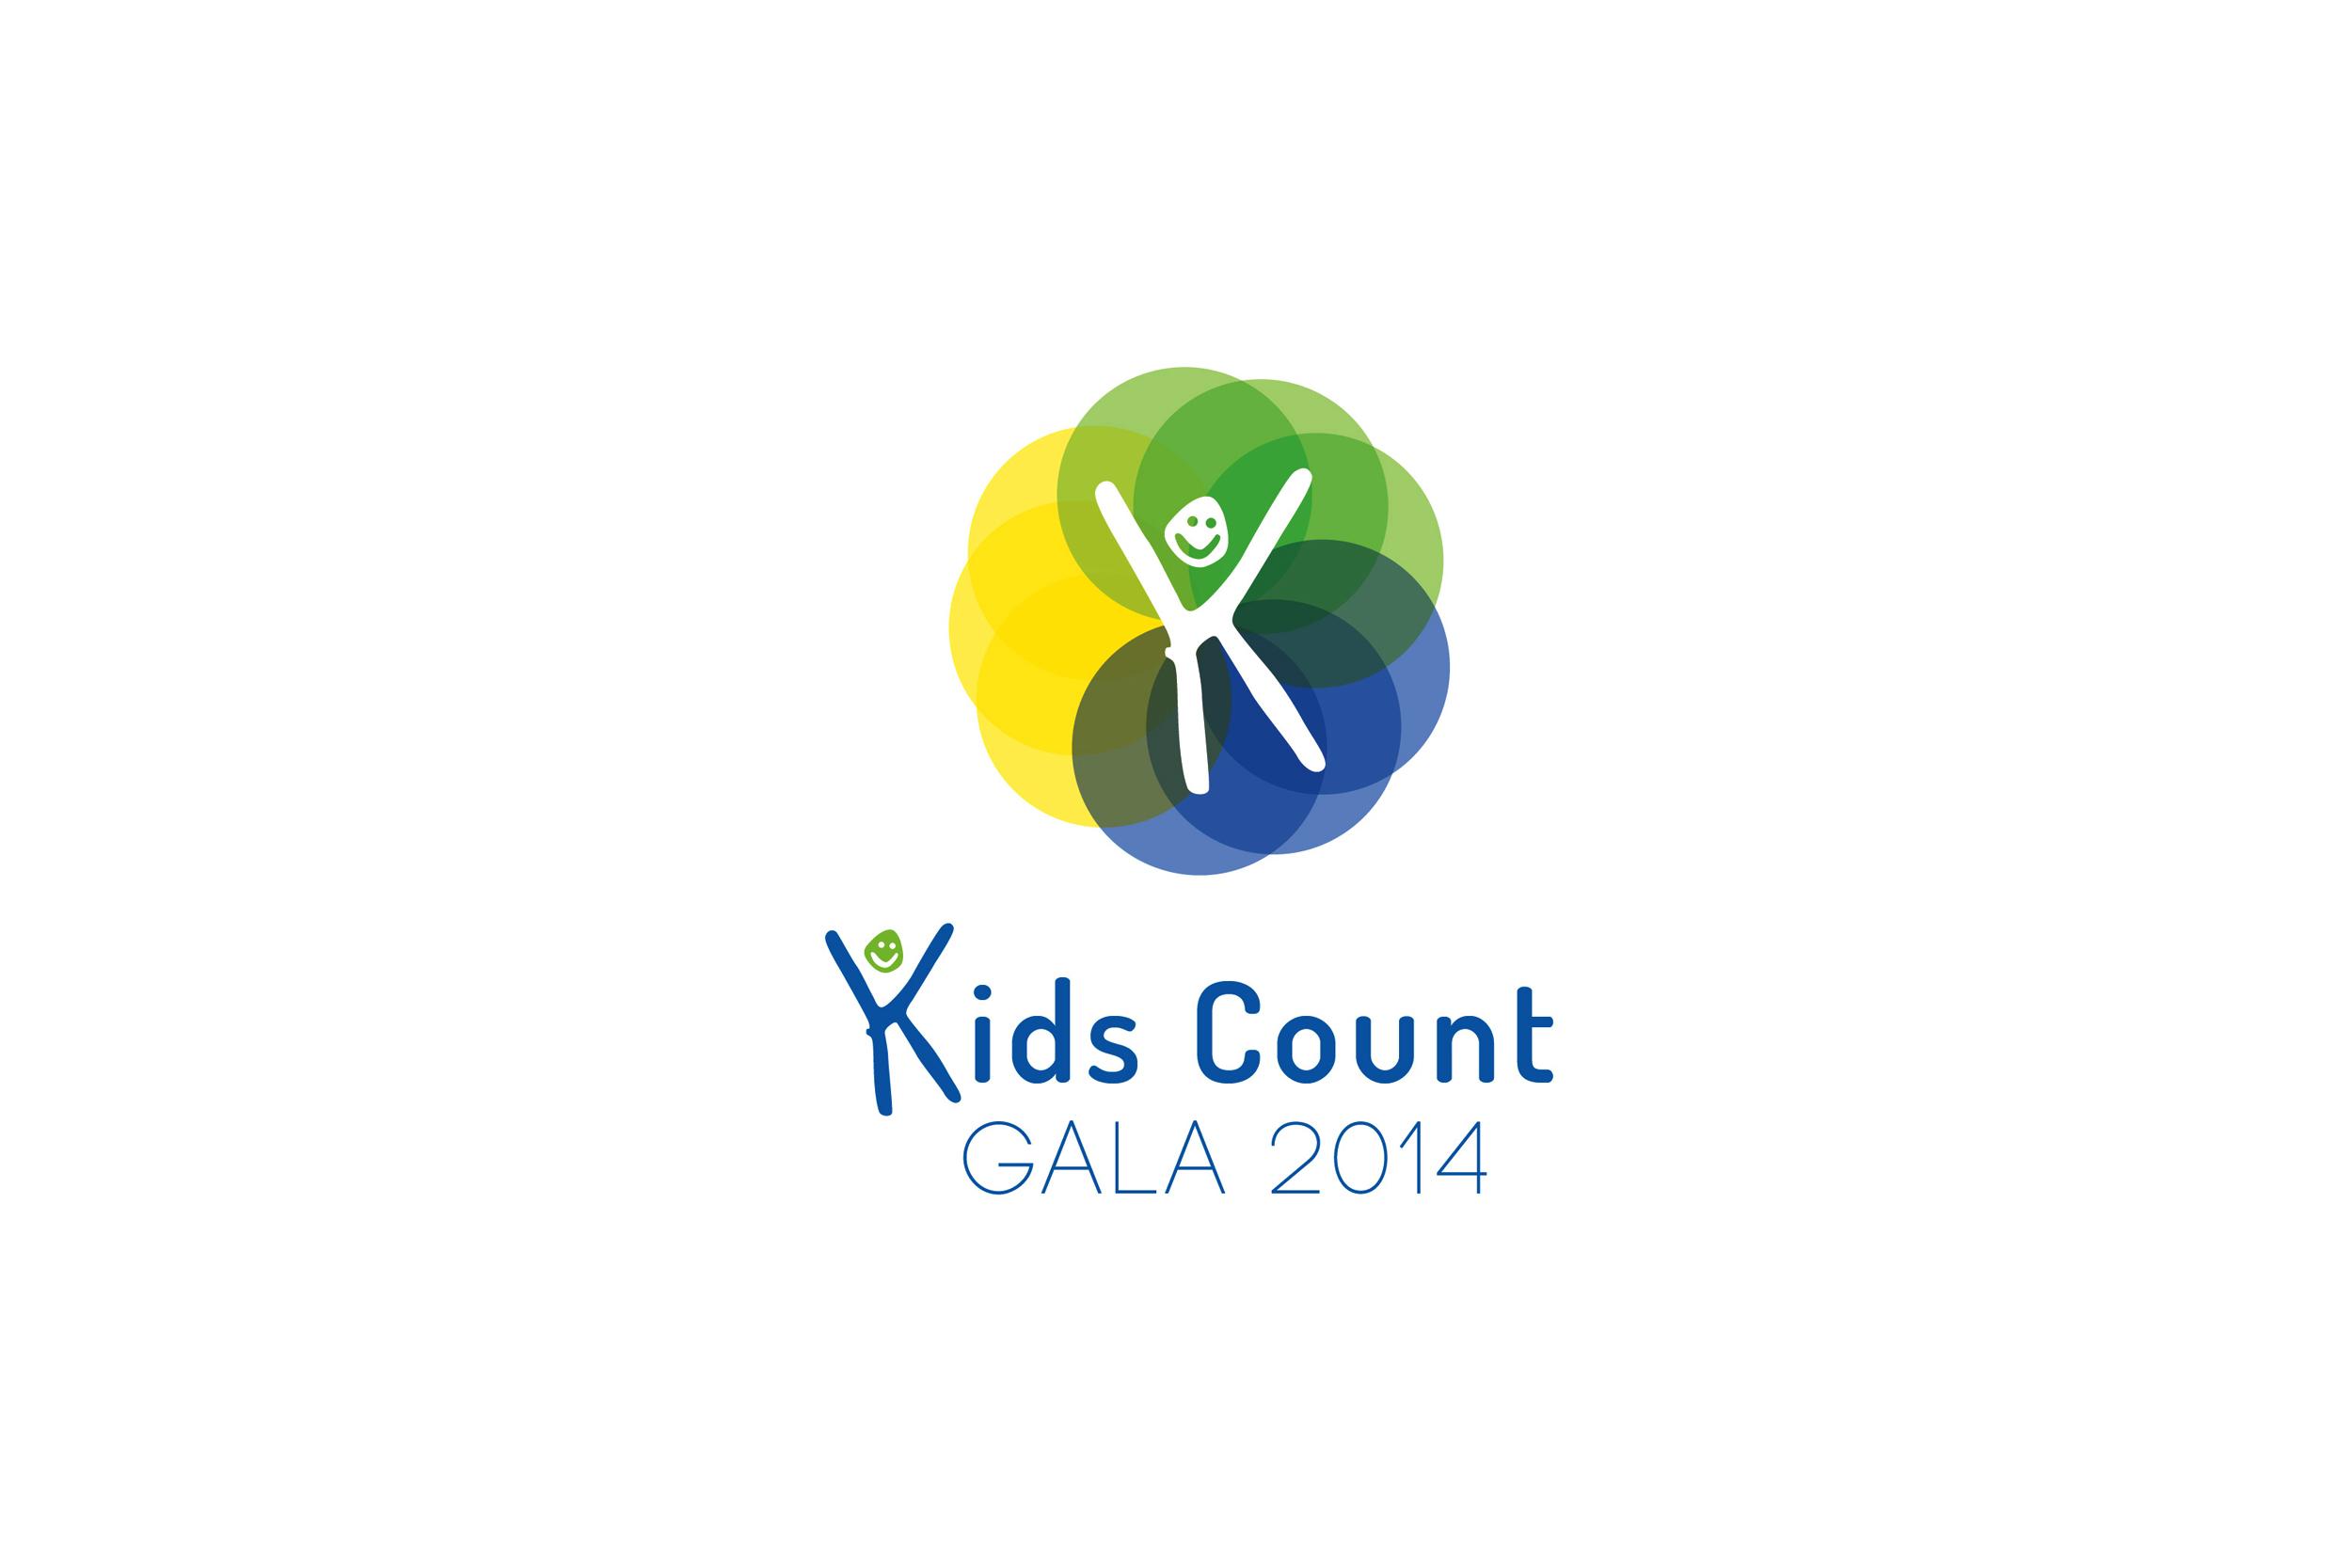 kids count logo_Web1.jpg